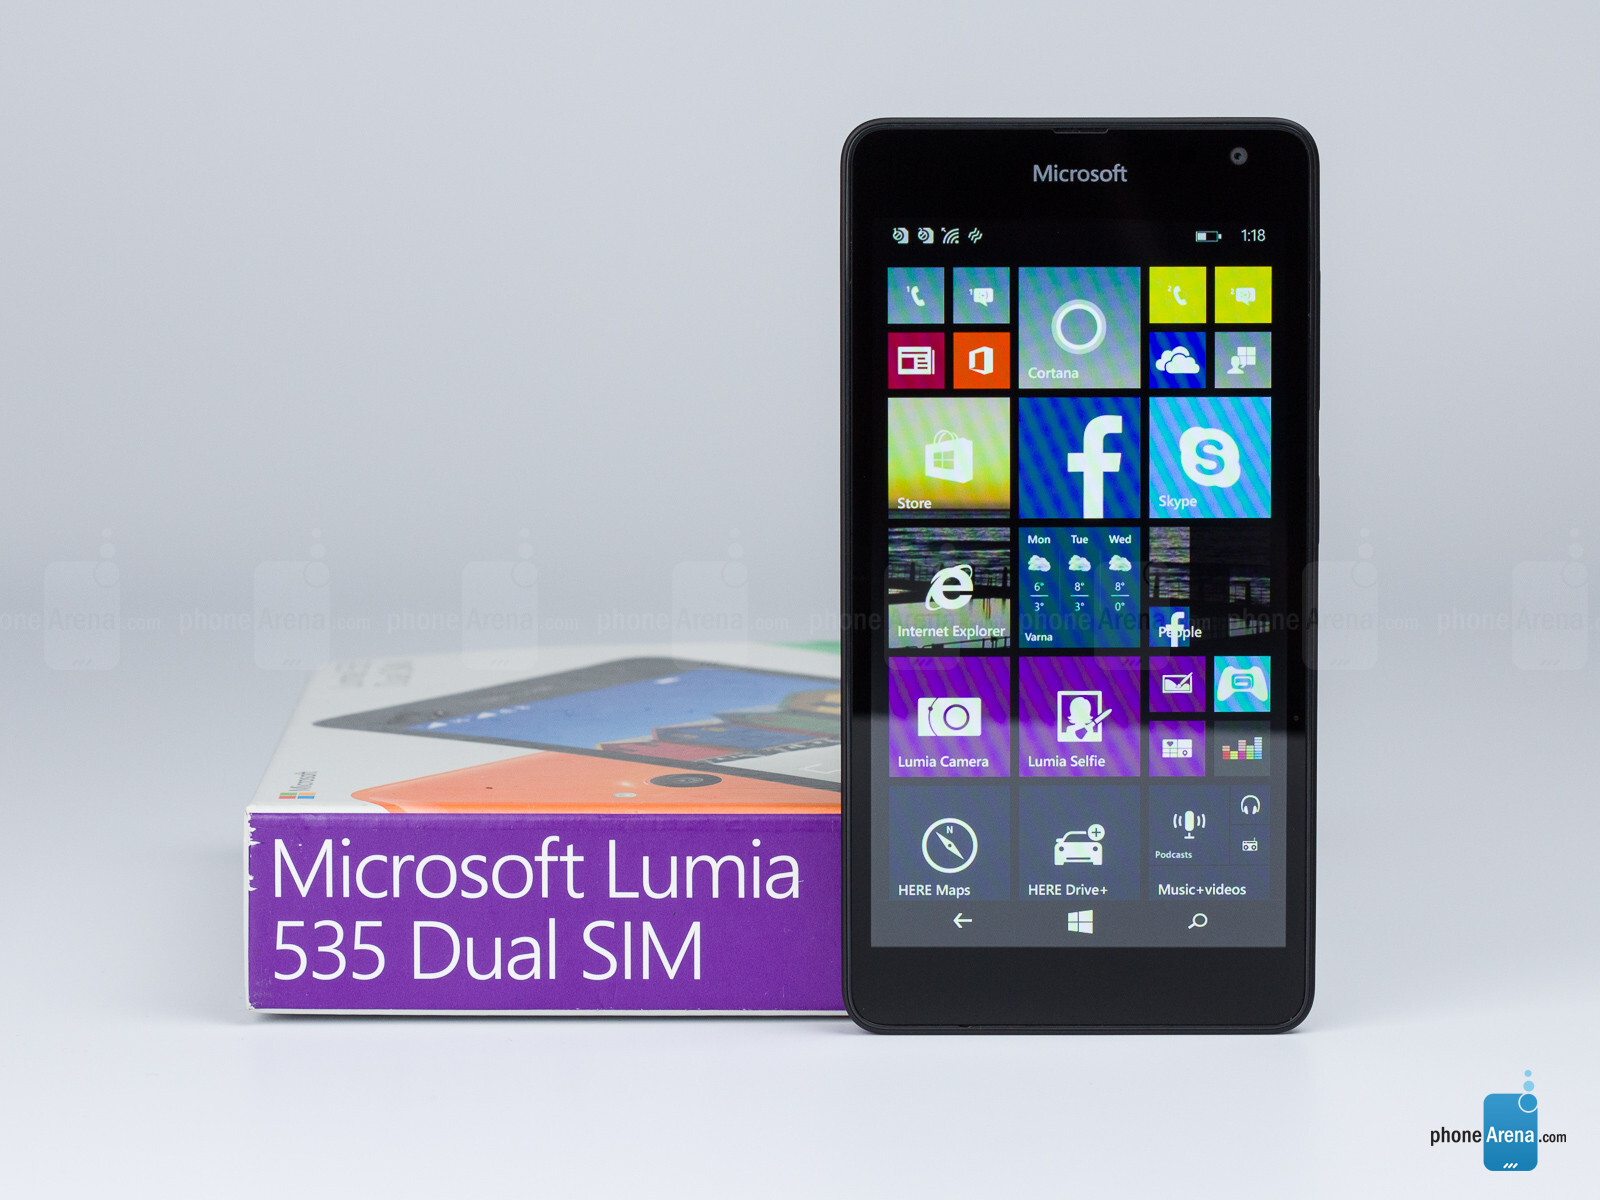 Microsoft lumia 535 dual sim white quad core 1 2ghz unlocked cell - Microsoft Lumia 535